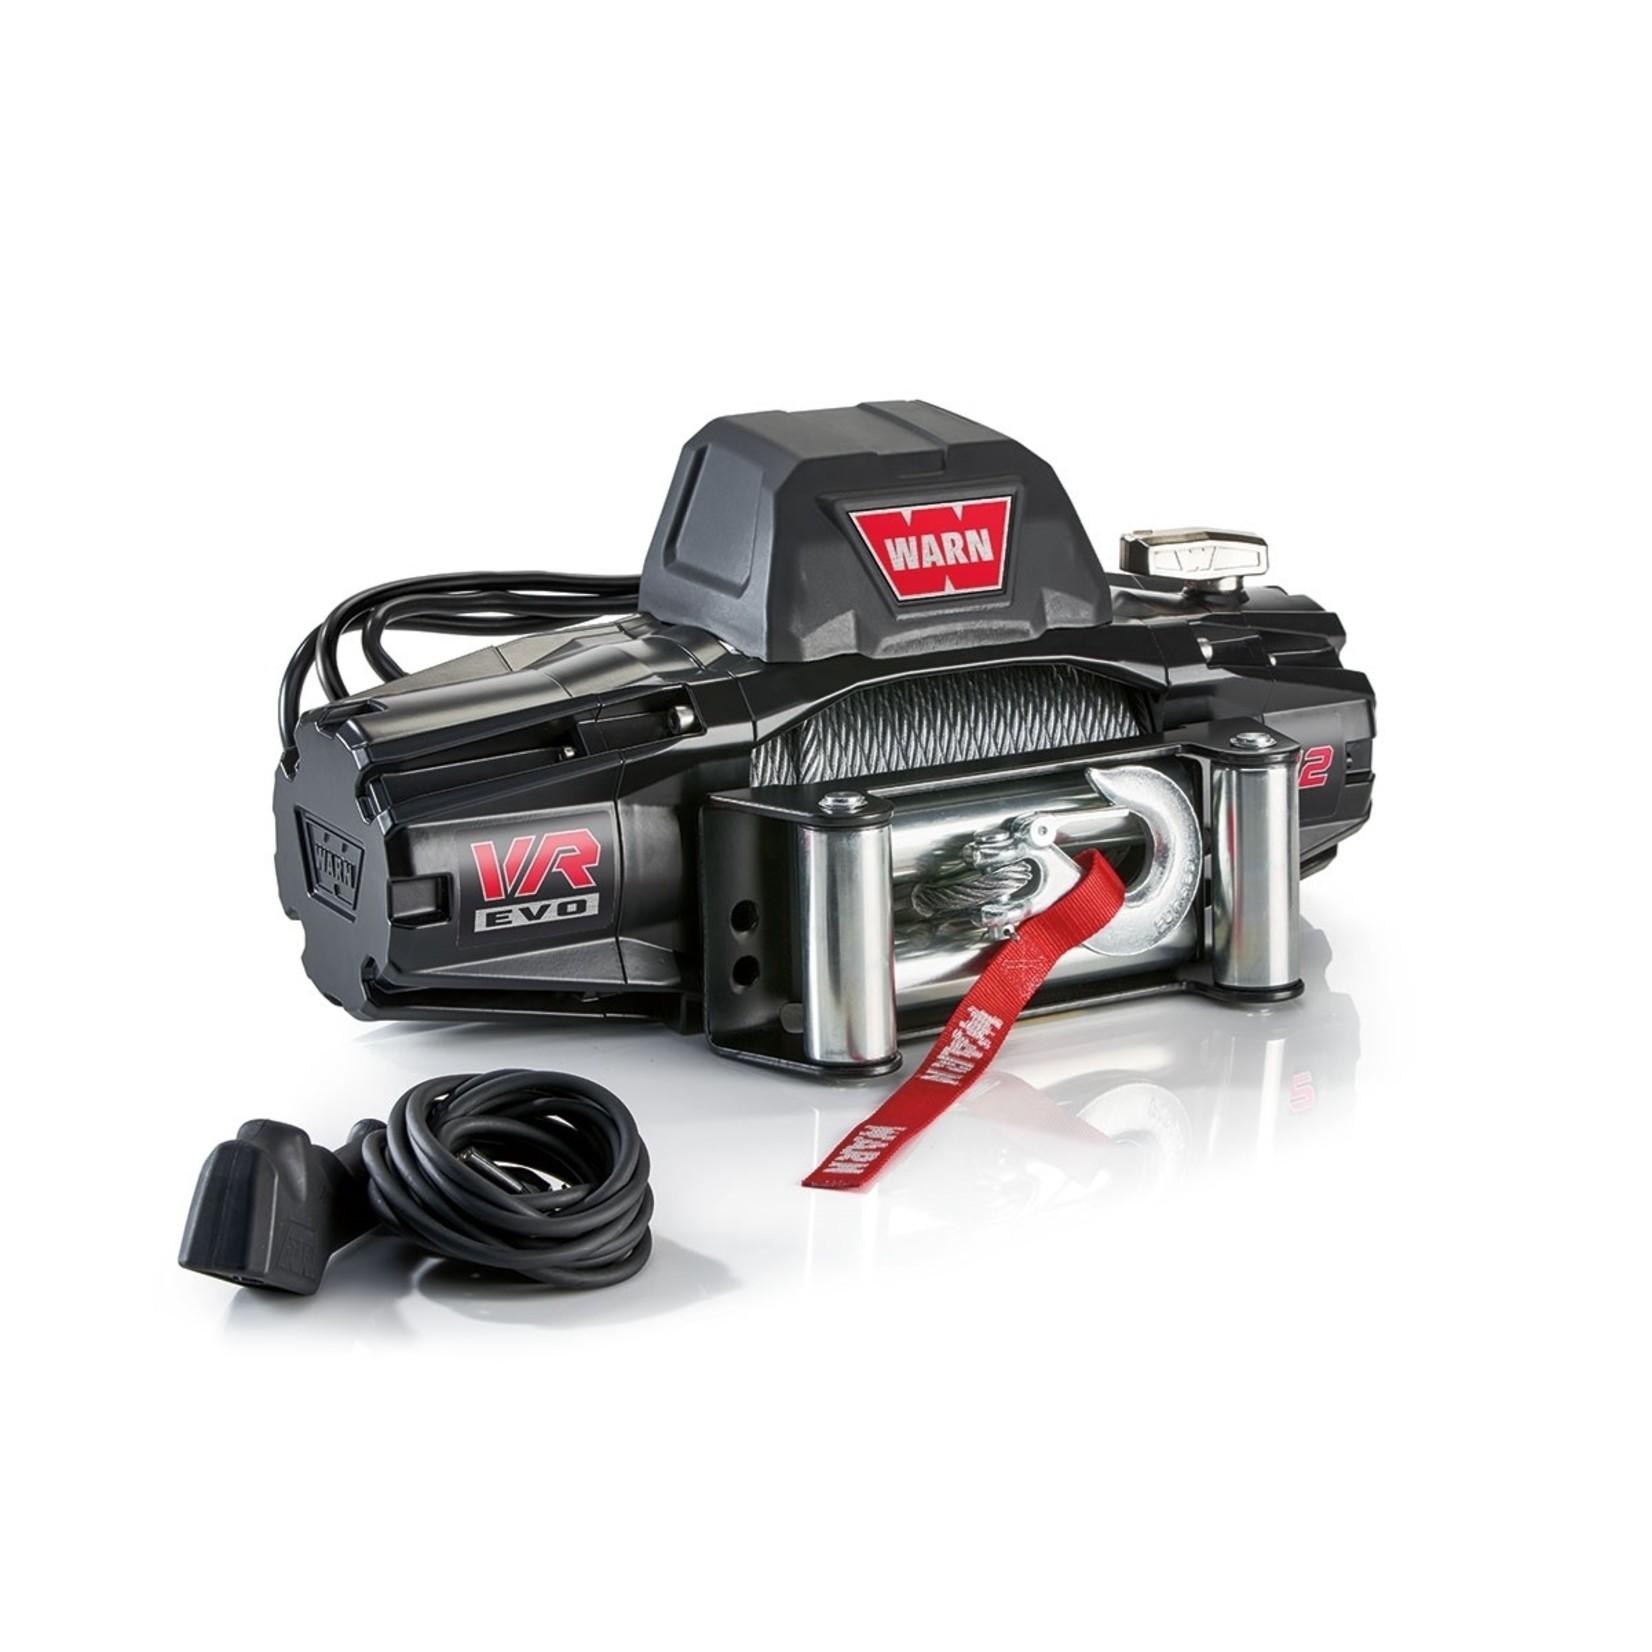 Warn VR EVO 12 Winch w/Steel Cable